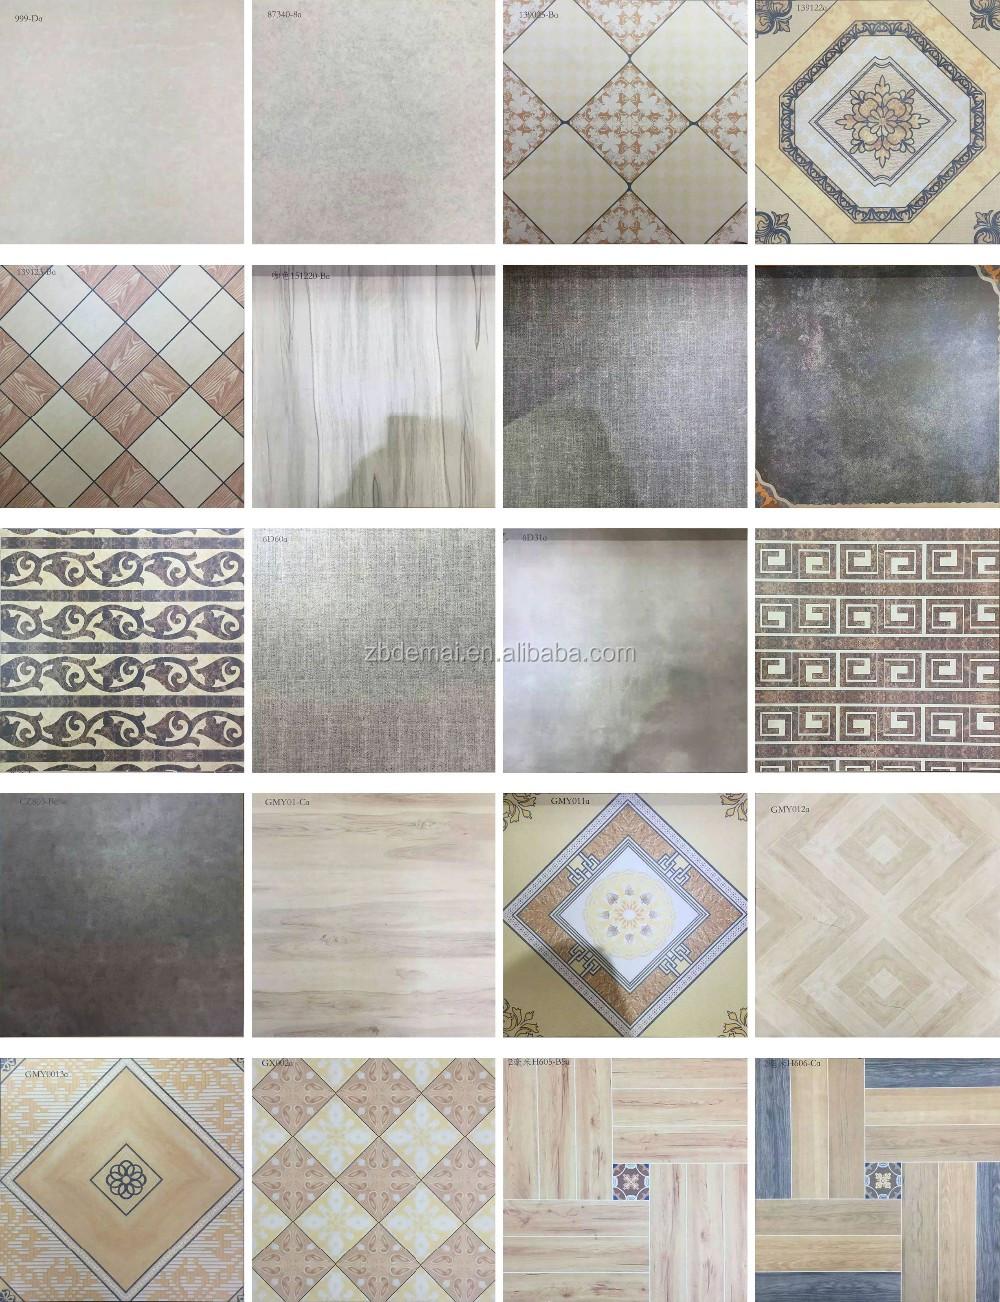 Raised floor systems rustic ceramic tile cutting porcelain tile 60 raised floor systems rustic ceramic tile cutting porcelain tile 6060cm dailygadgetfo Gallery